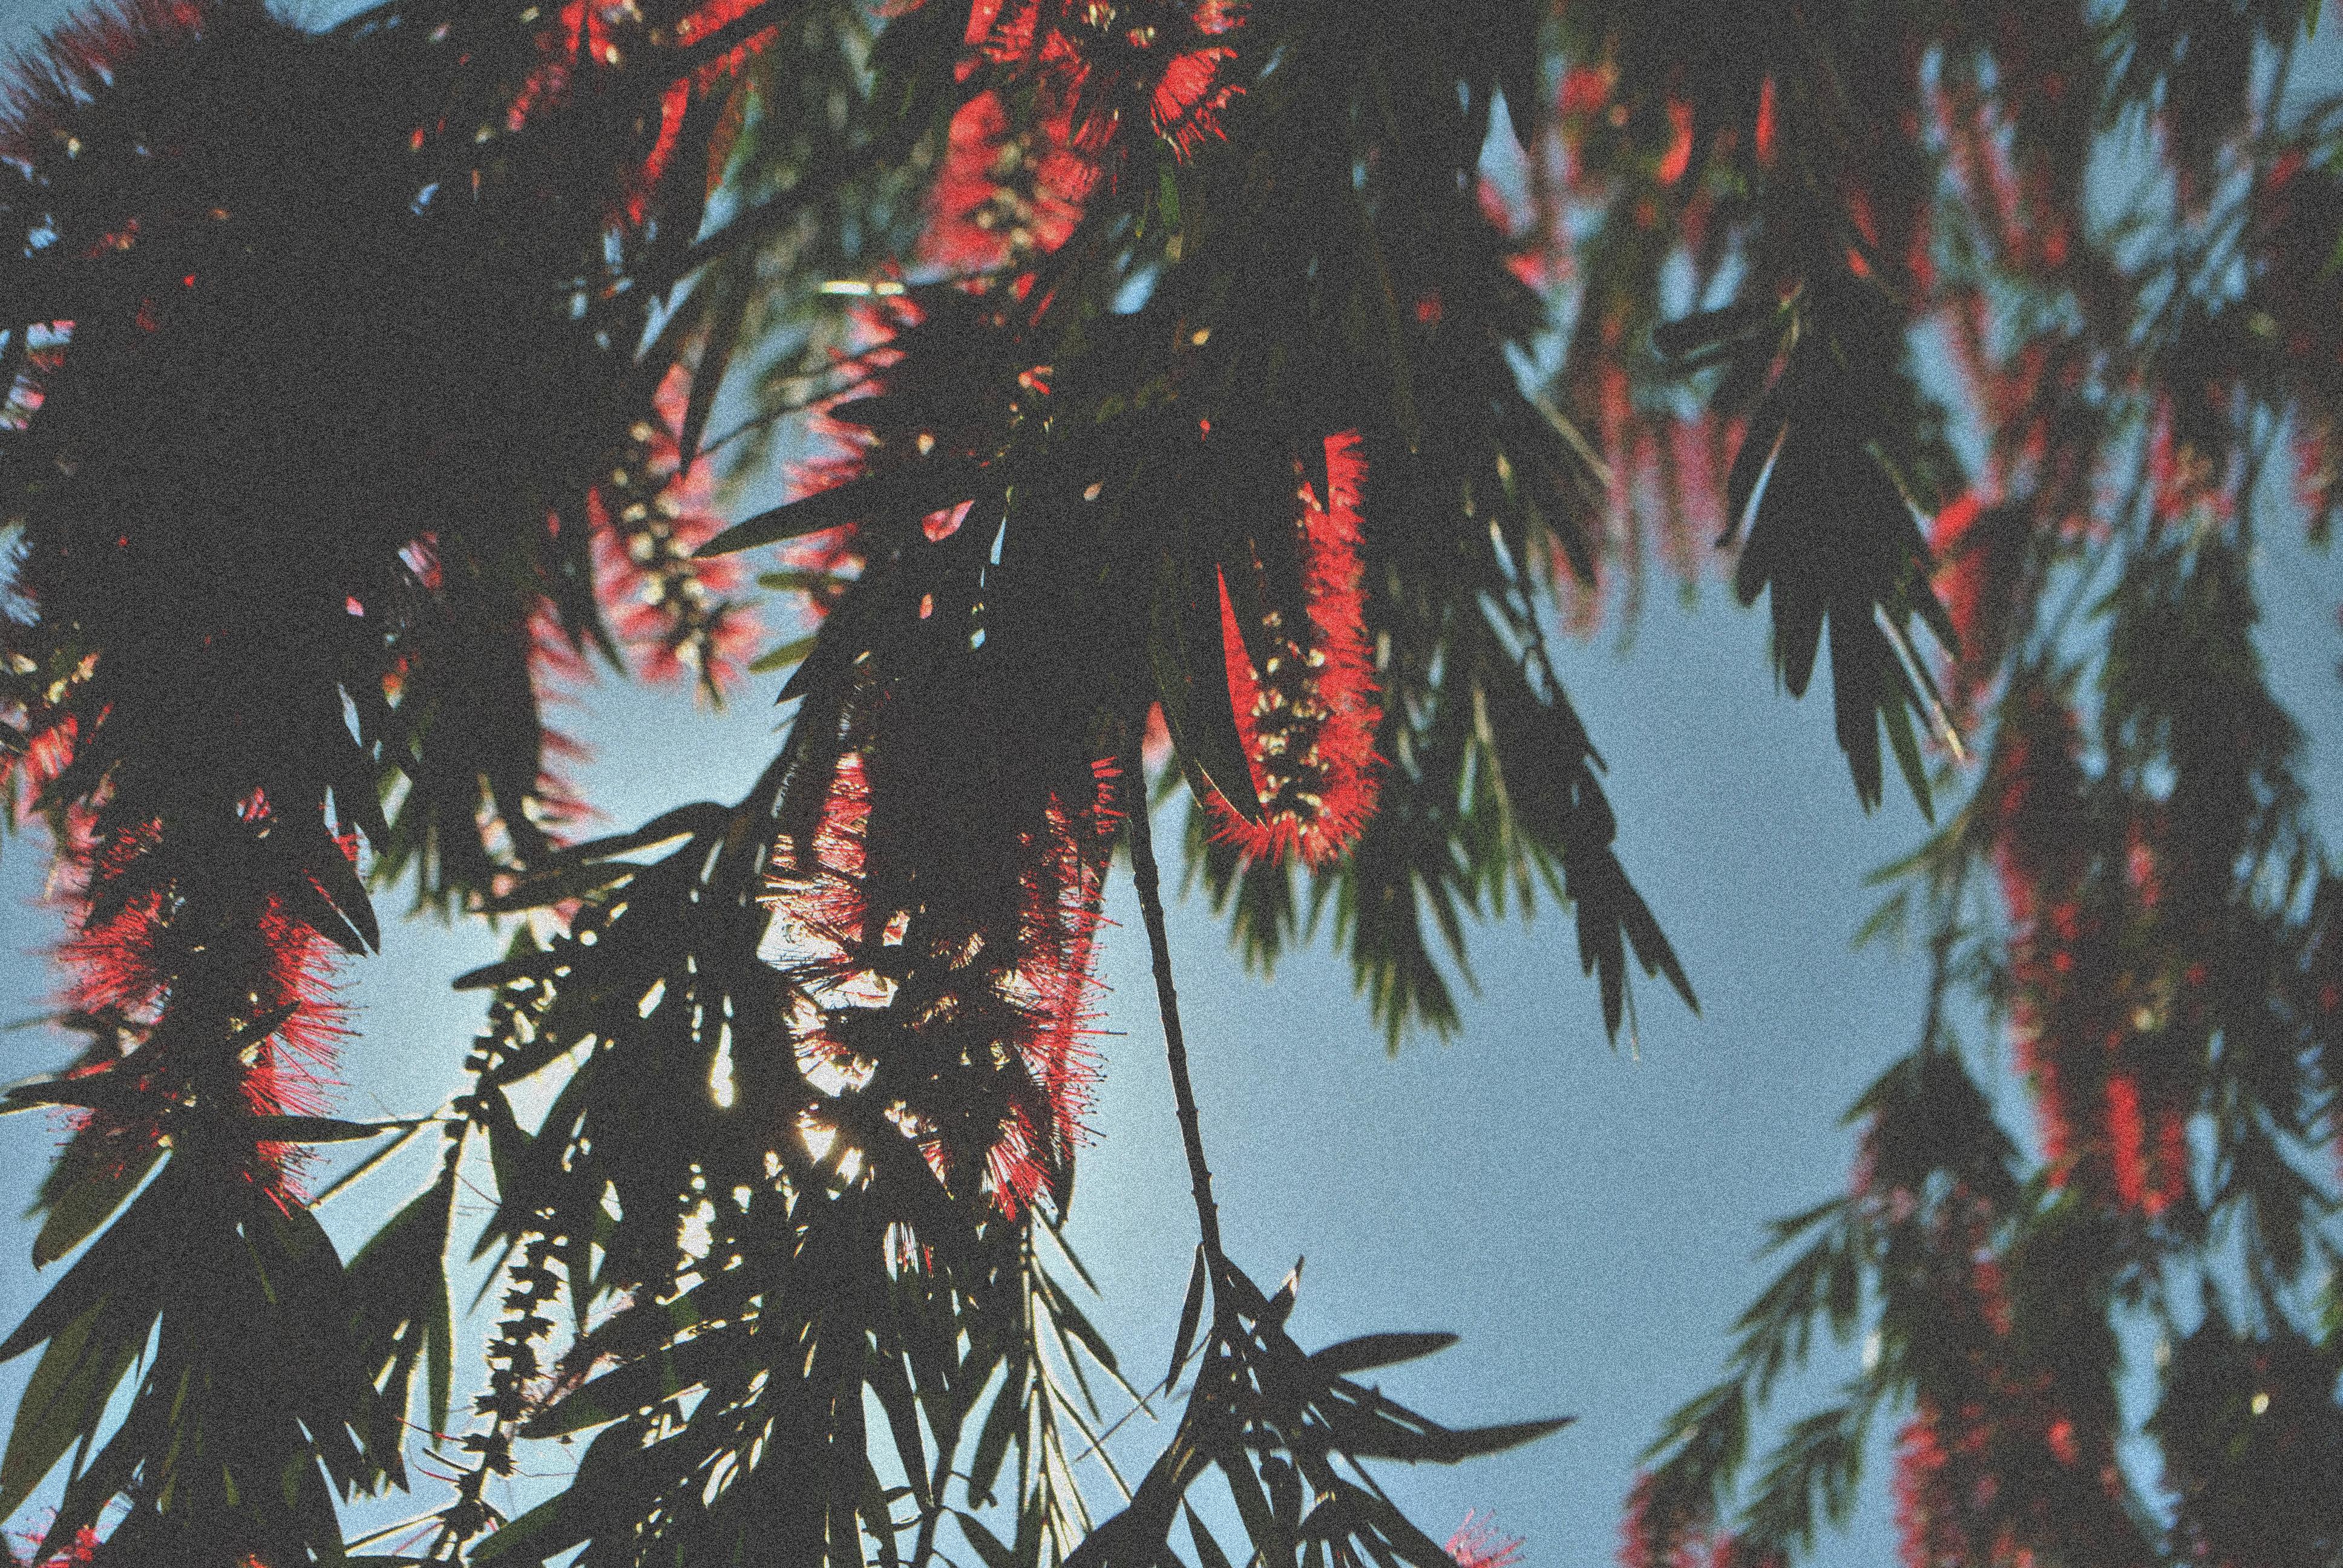 Wallpaper Trees Forest Leaves White Black Photoshop Portrait